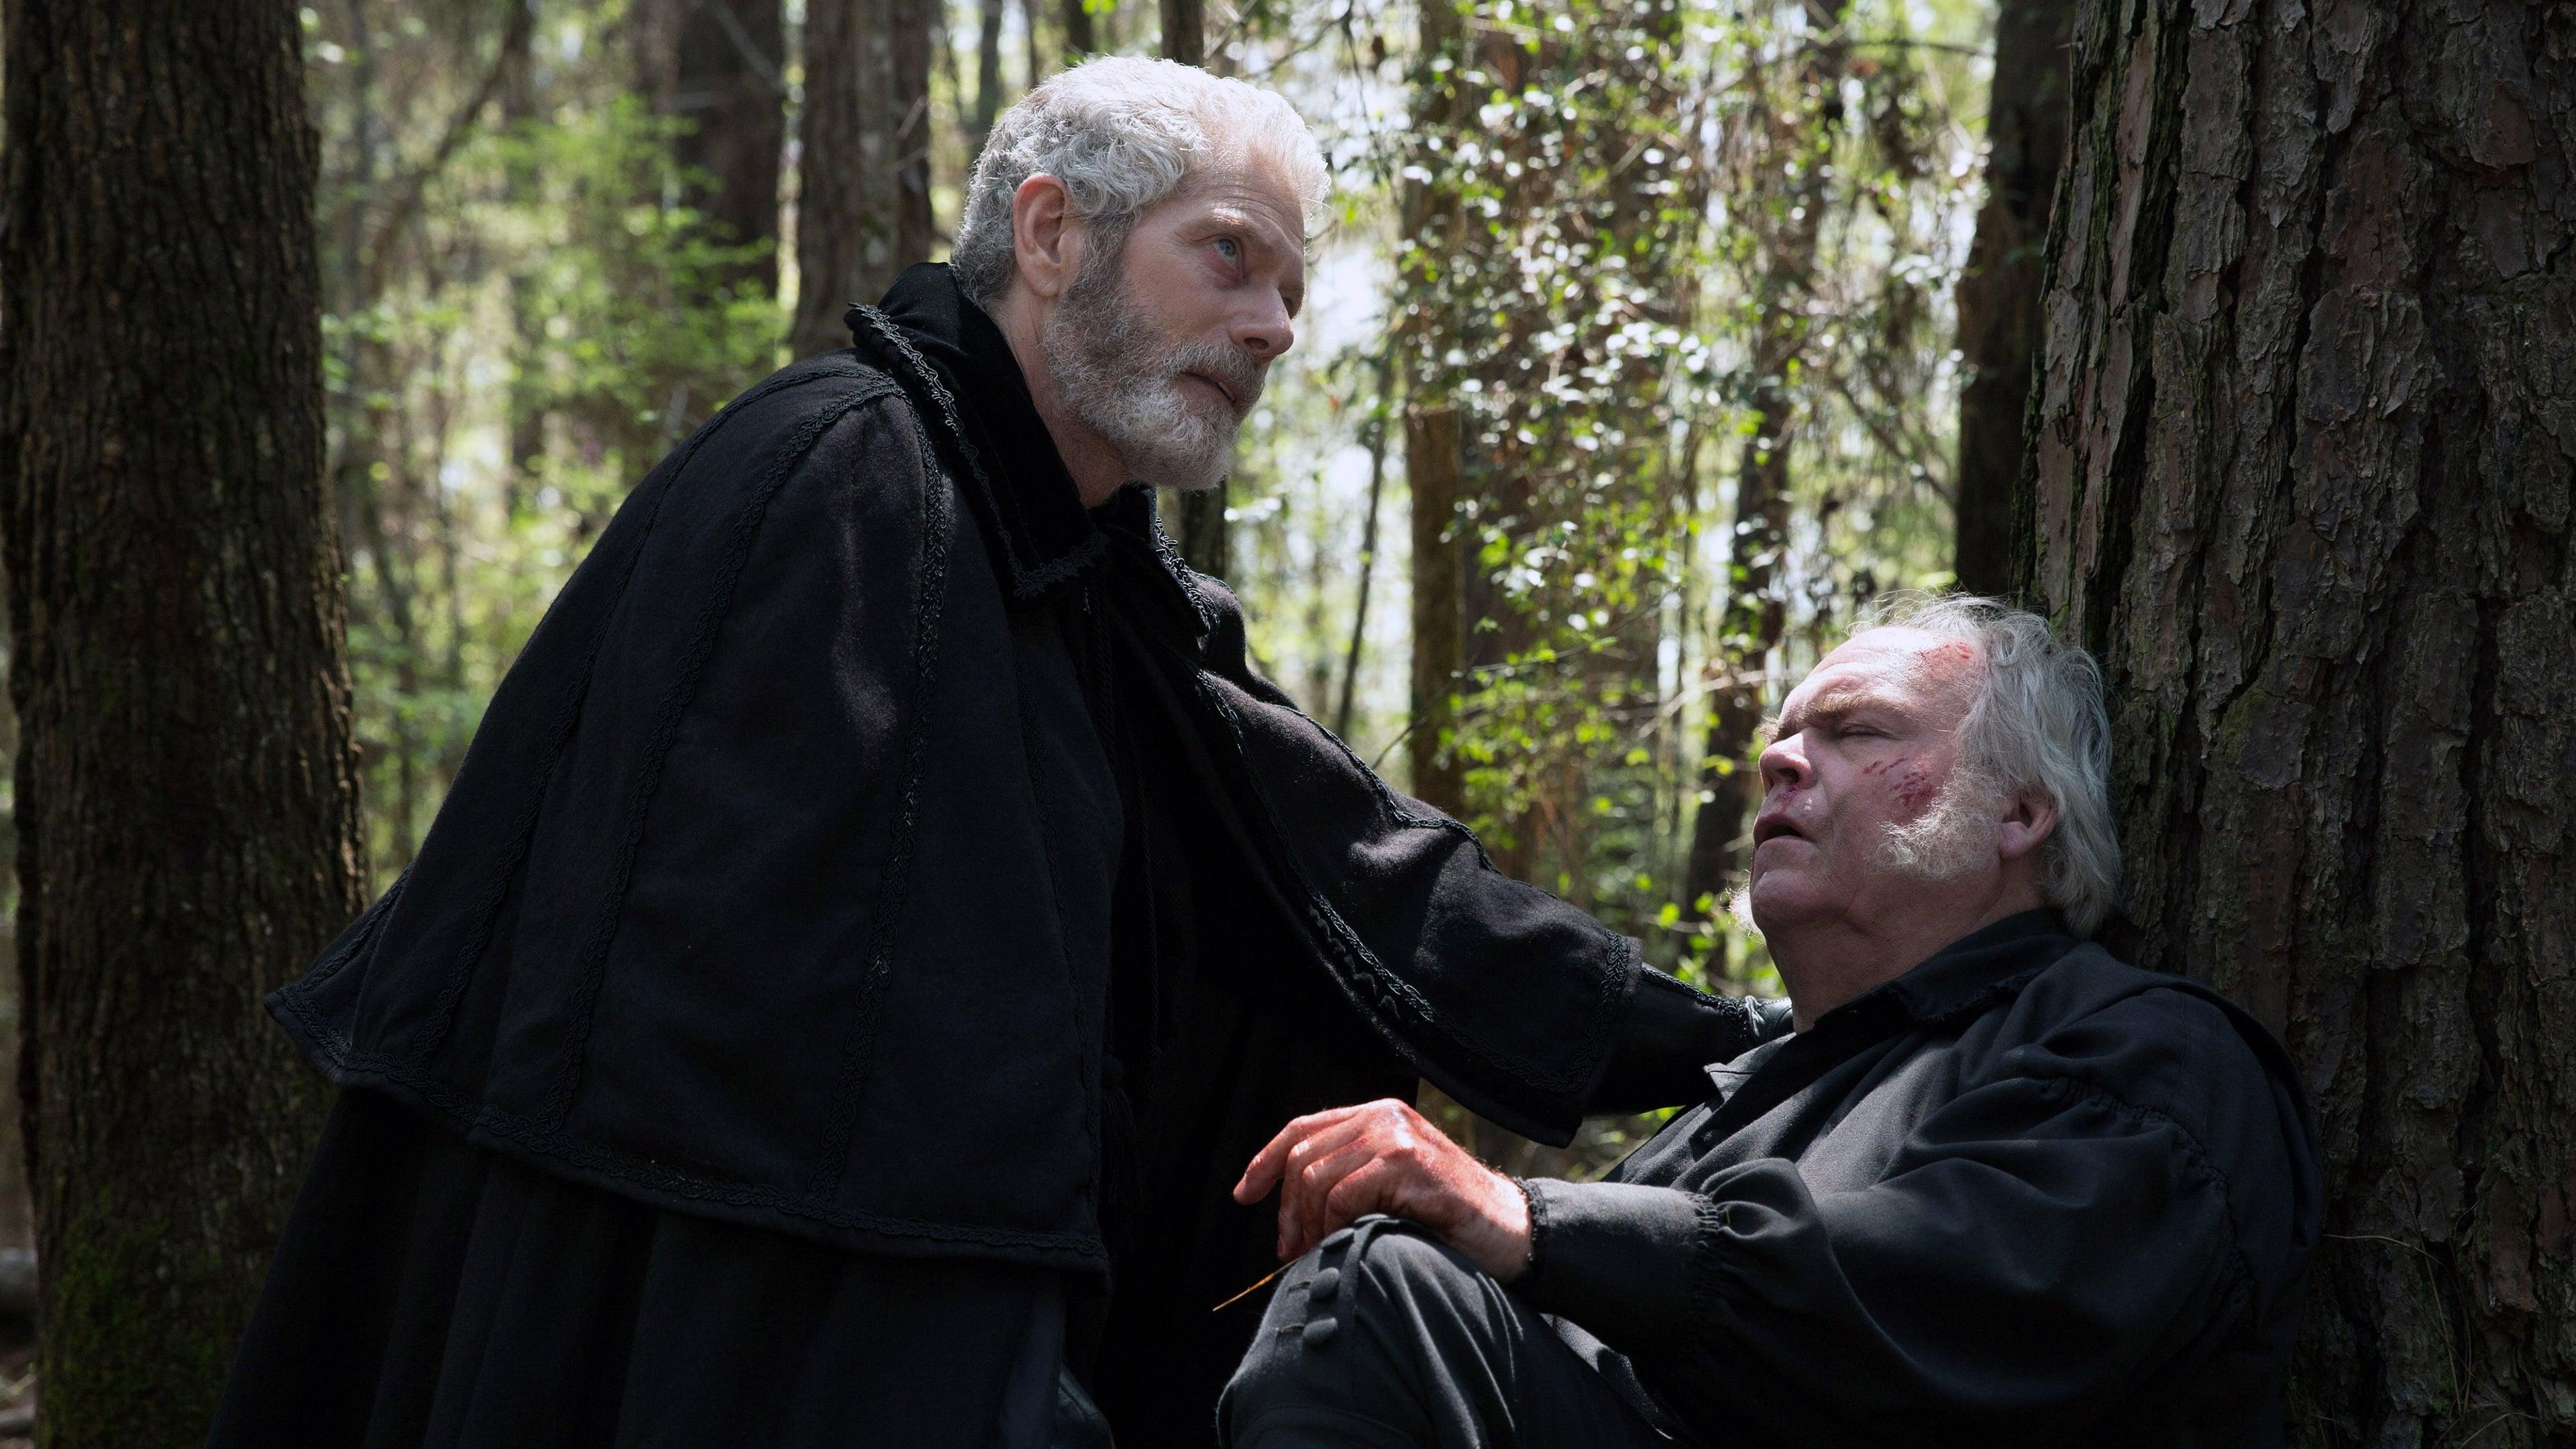 Salem Saison 1 Episode 8 Streaming